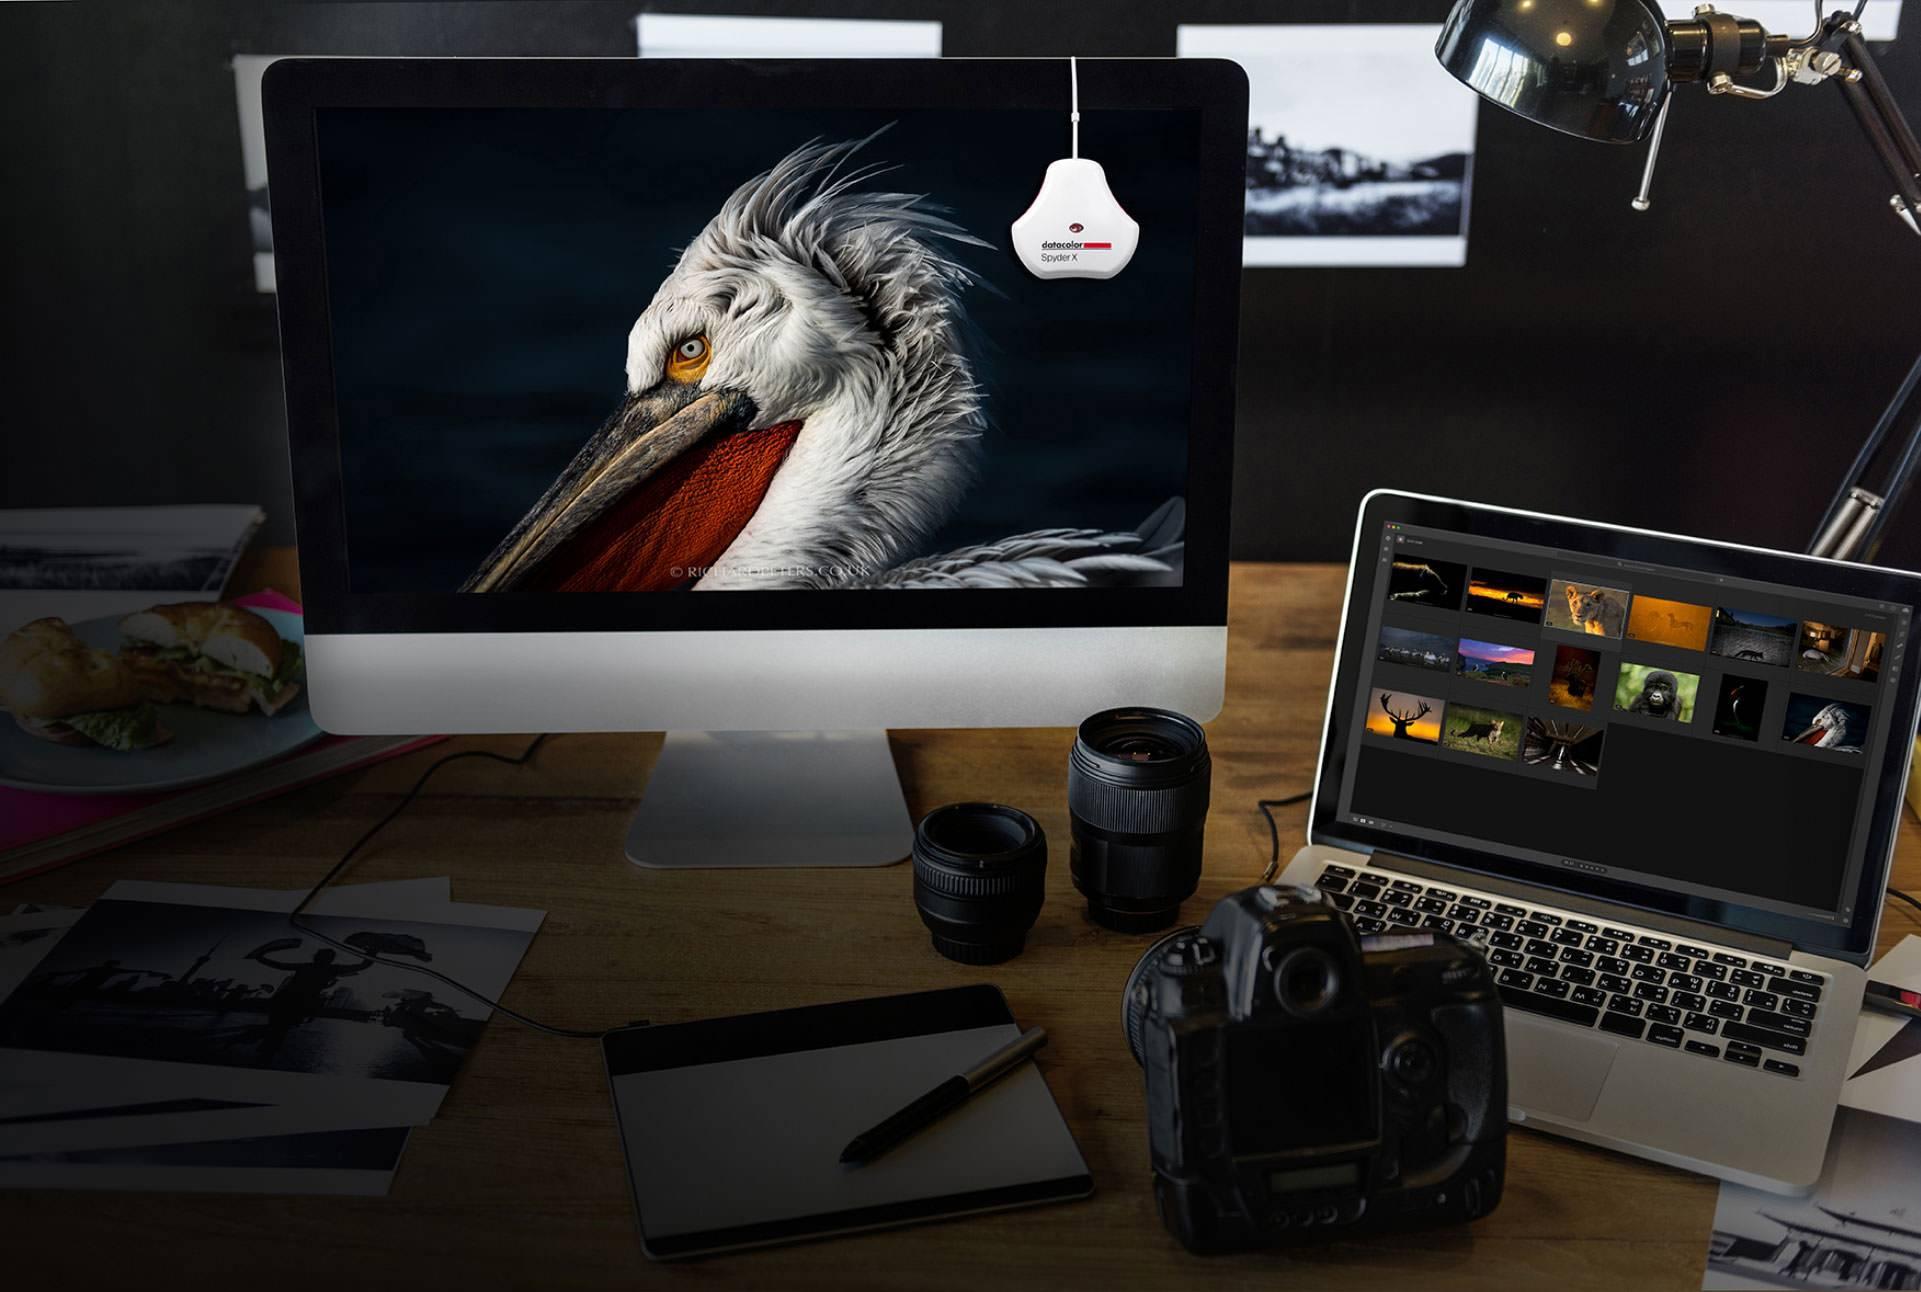 calibrating an image of a bird shown in a desktop computer